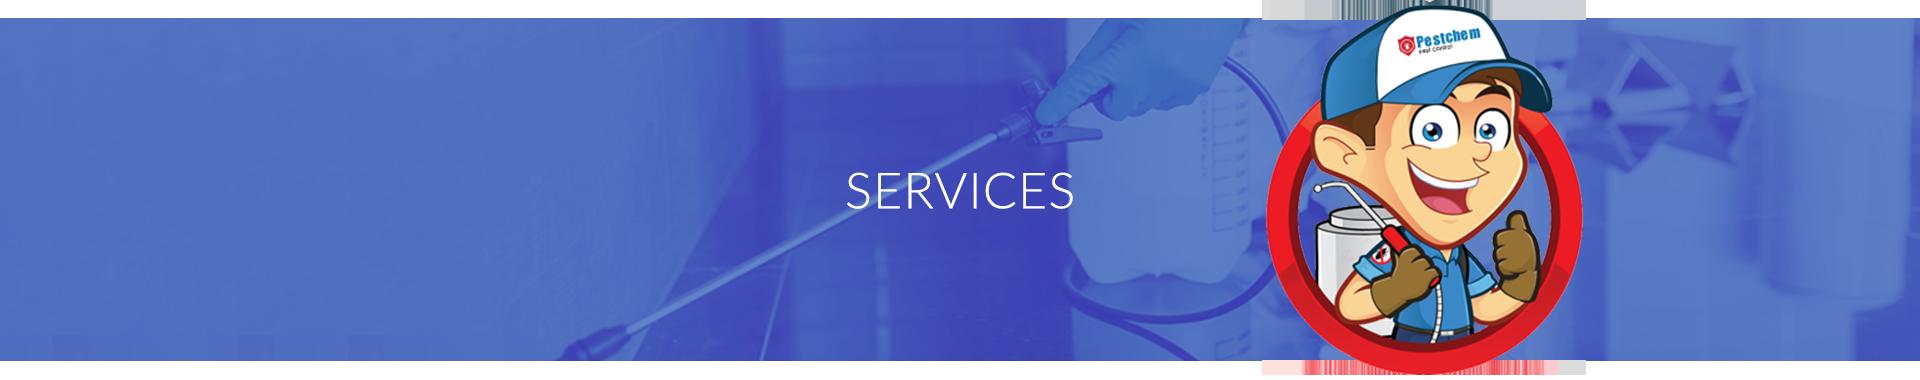 PestChem Services Banner